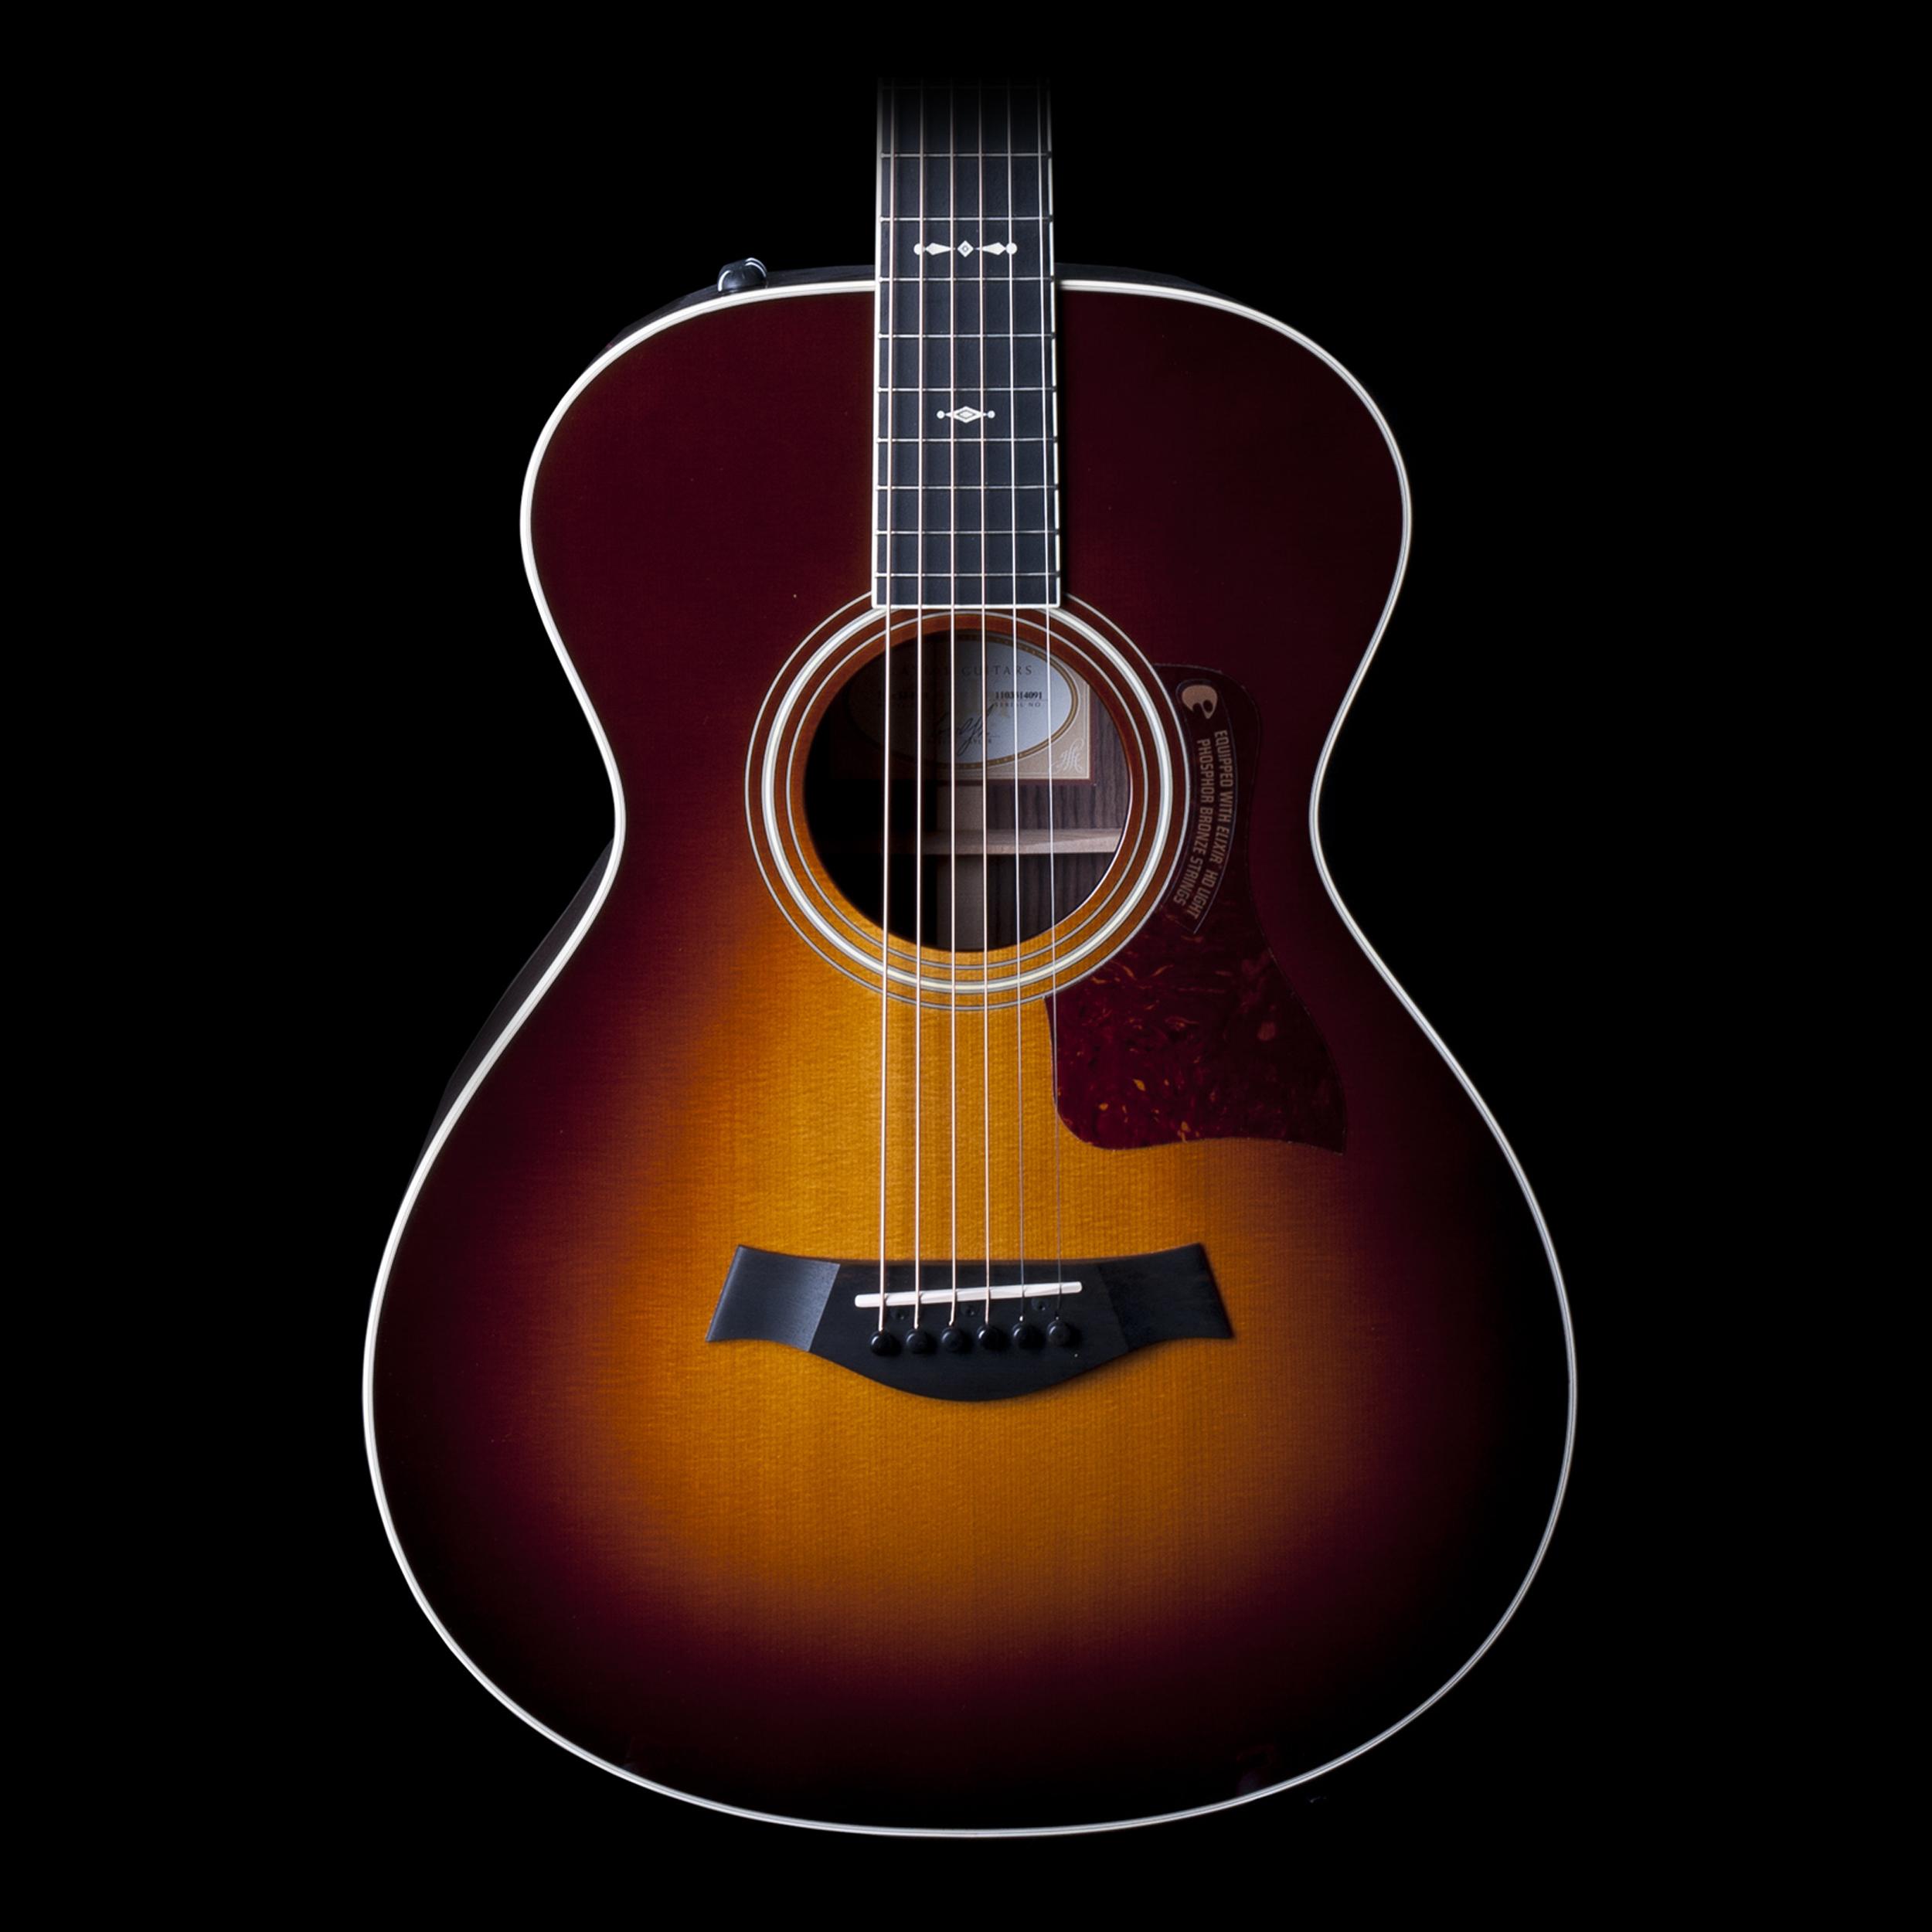 taylor 712e 12 fret grand concert acoustic electric guitar sunburst w case ebay. Black Bedroom Furniture Sets. Home Design Ideas